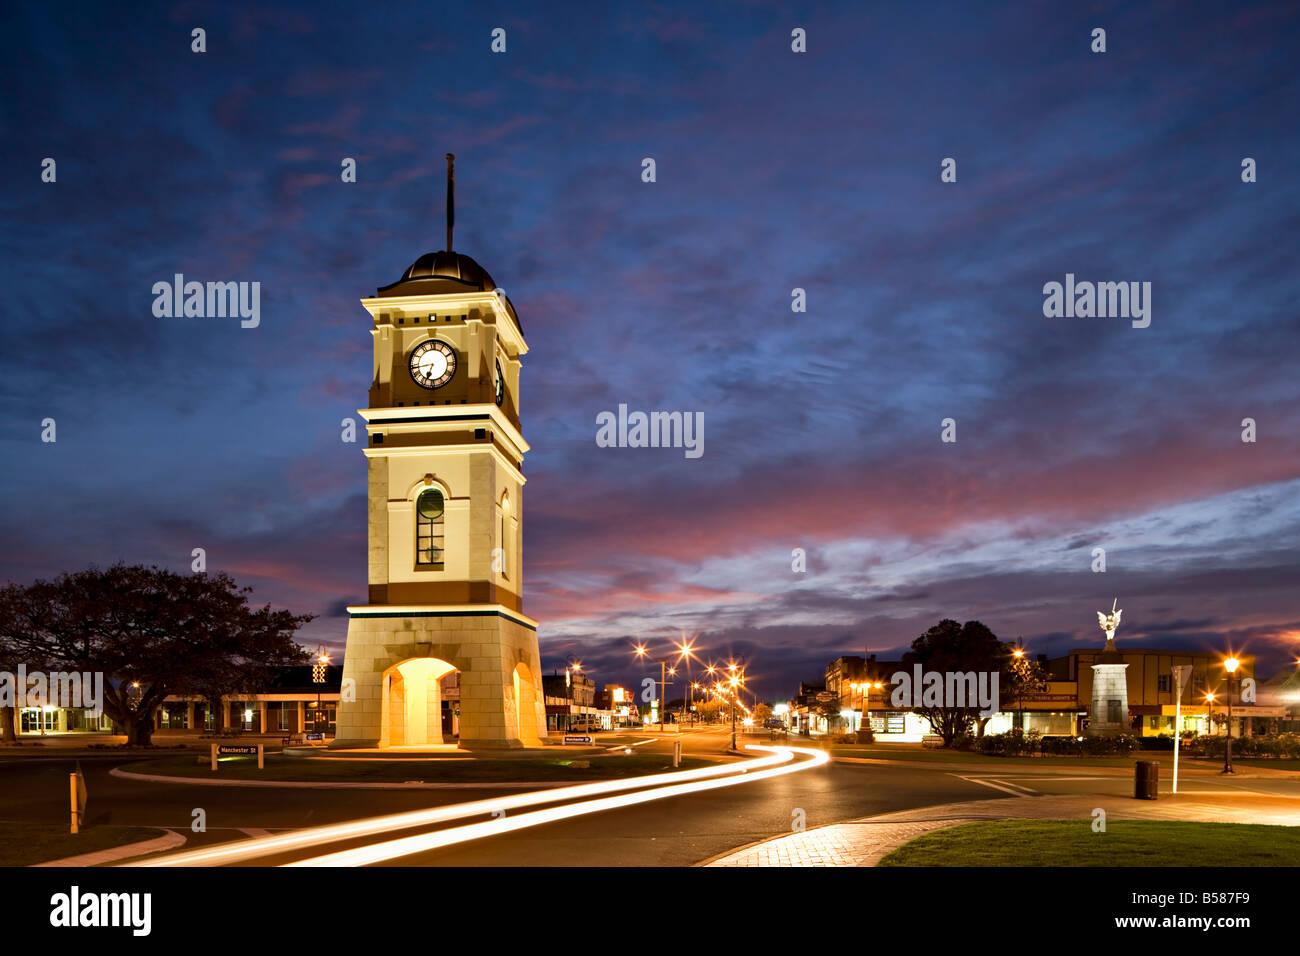 Clock tower in the square, Feilding, Manawatu, North Island, New Zealand, Pacific - Stock Image